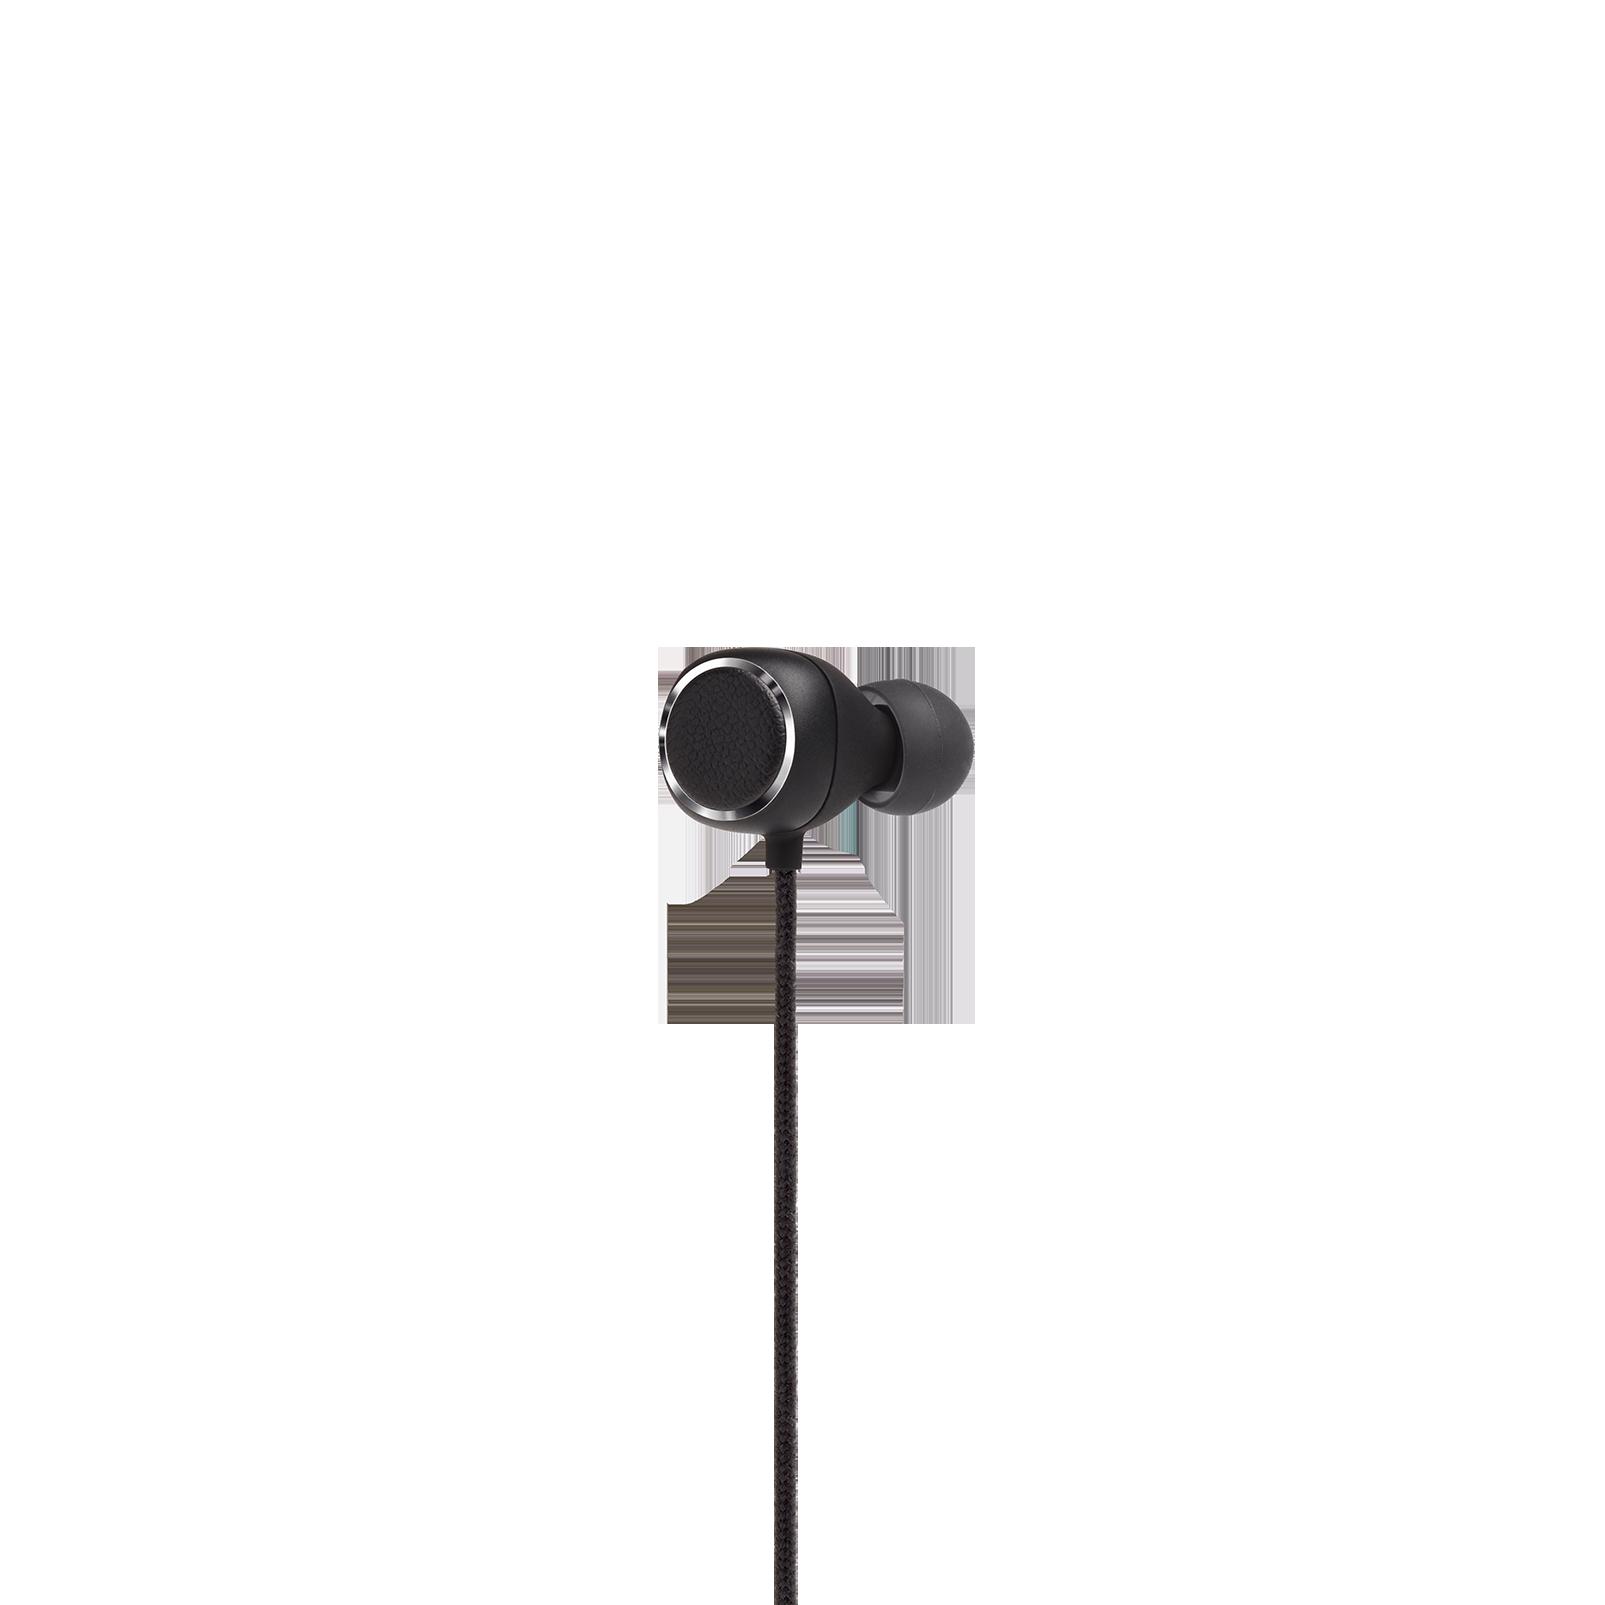 Harman Kardon FLY BT - Black - Bluetooth in-ear headphones - Back